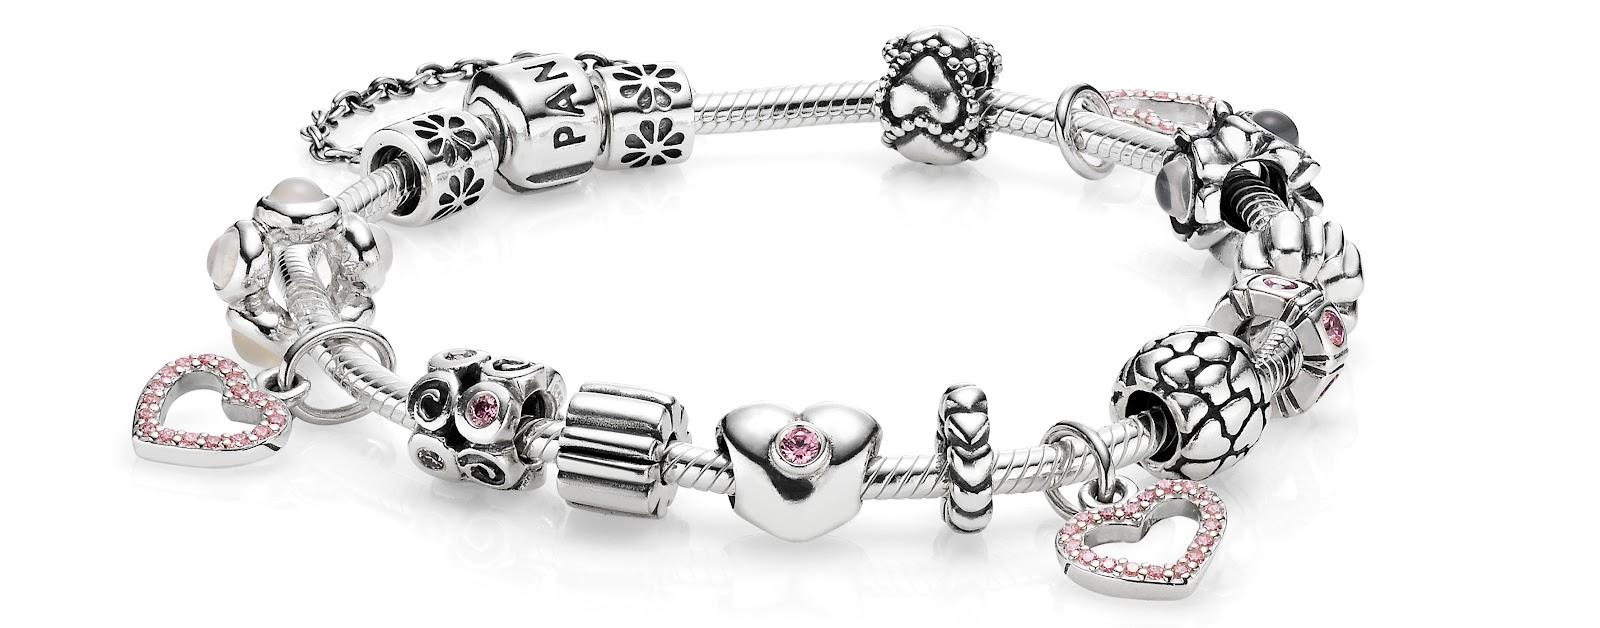 pandora bracelet charms zales